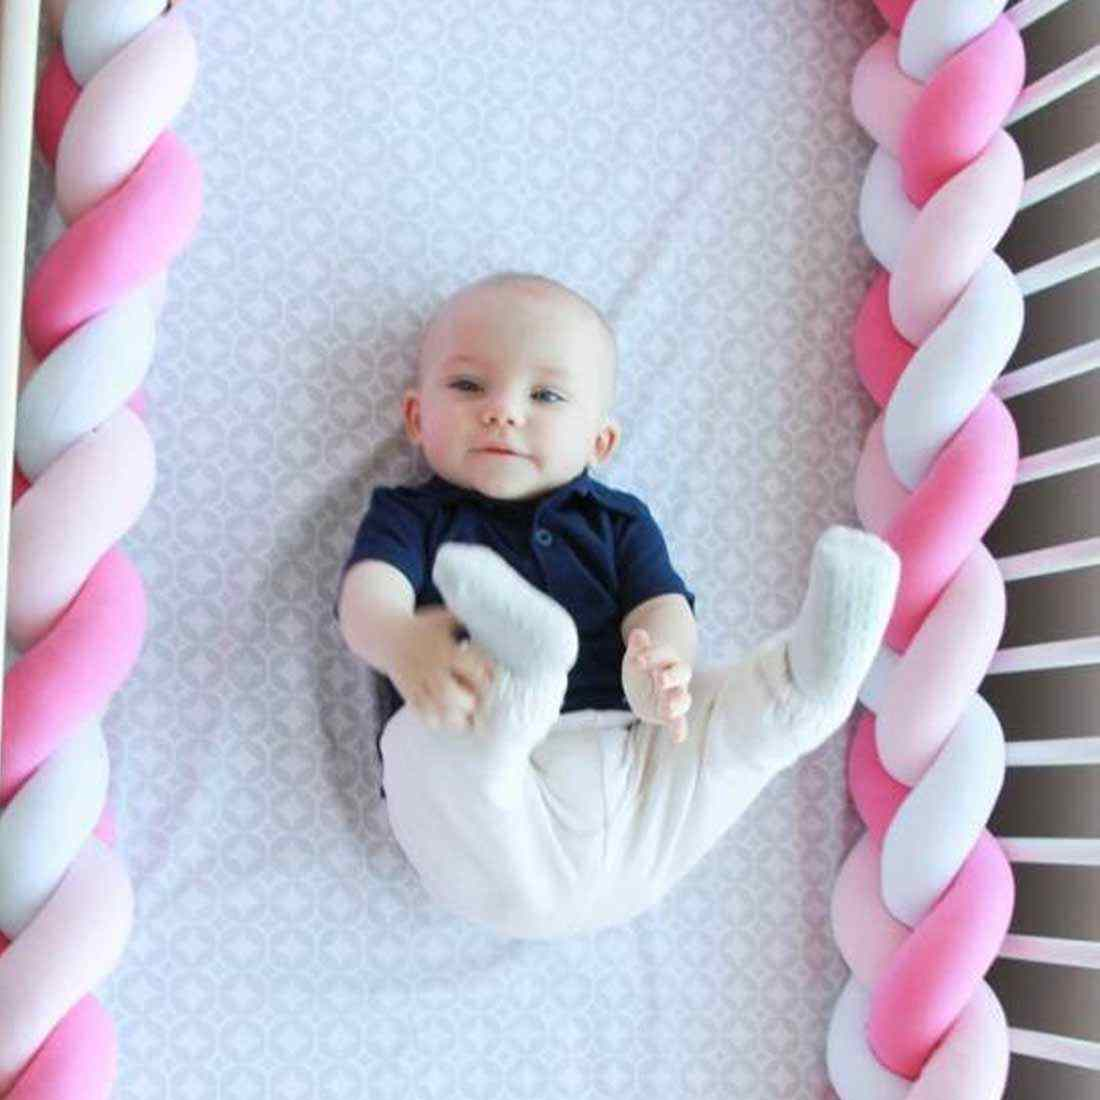 1 M/2 M/3 M תינוק בעבודת יד קשר יילוד מיטת פגוש ארוך מסוקס צמת כרית תינוק מיטה פגוש קשר עריסה תינוקות חדר דקור